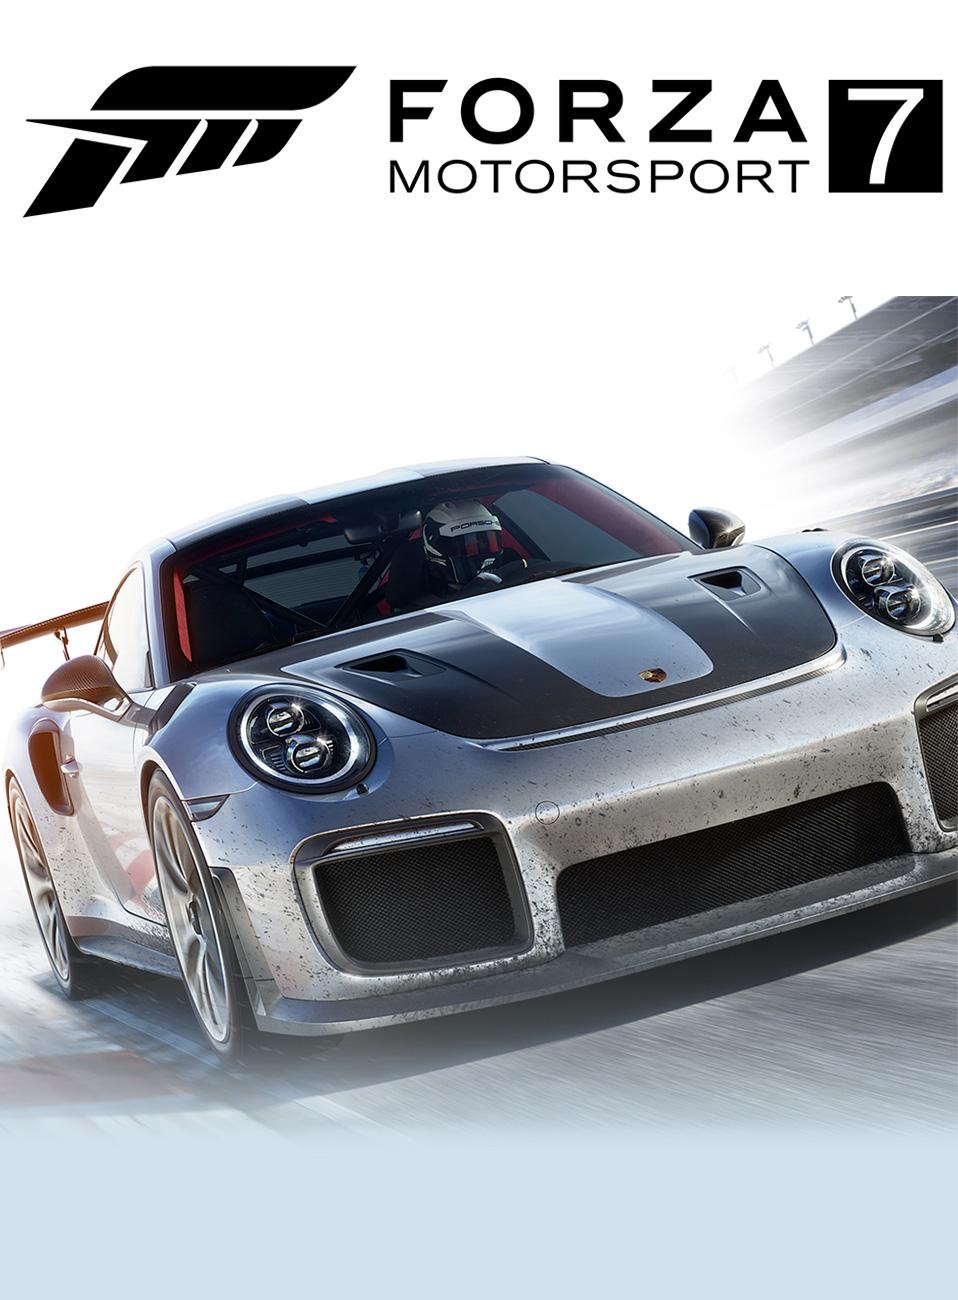 Forza motorsport 7 for Mobilia webhallen